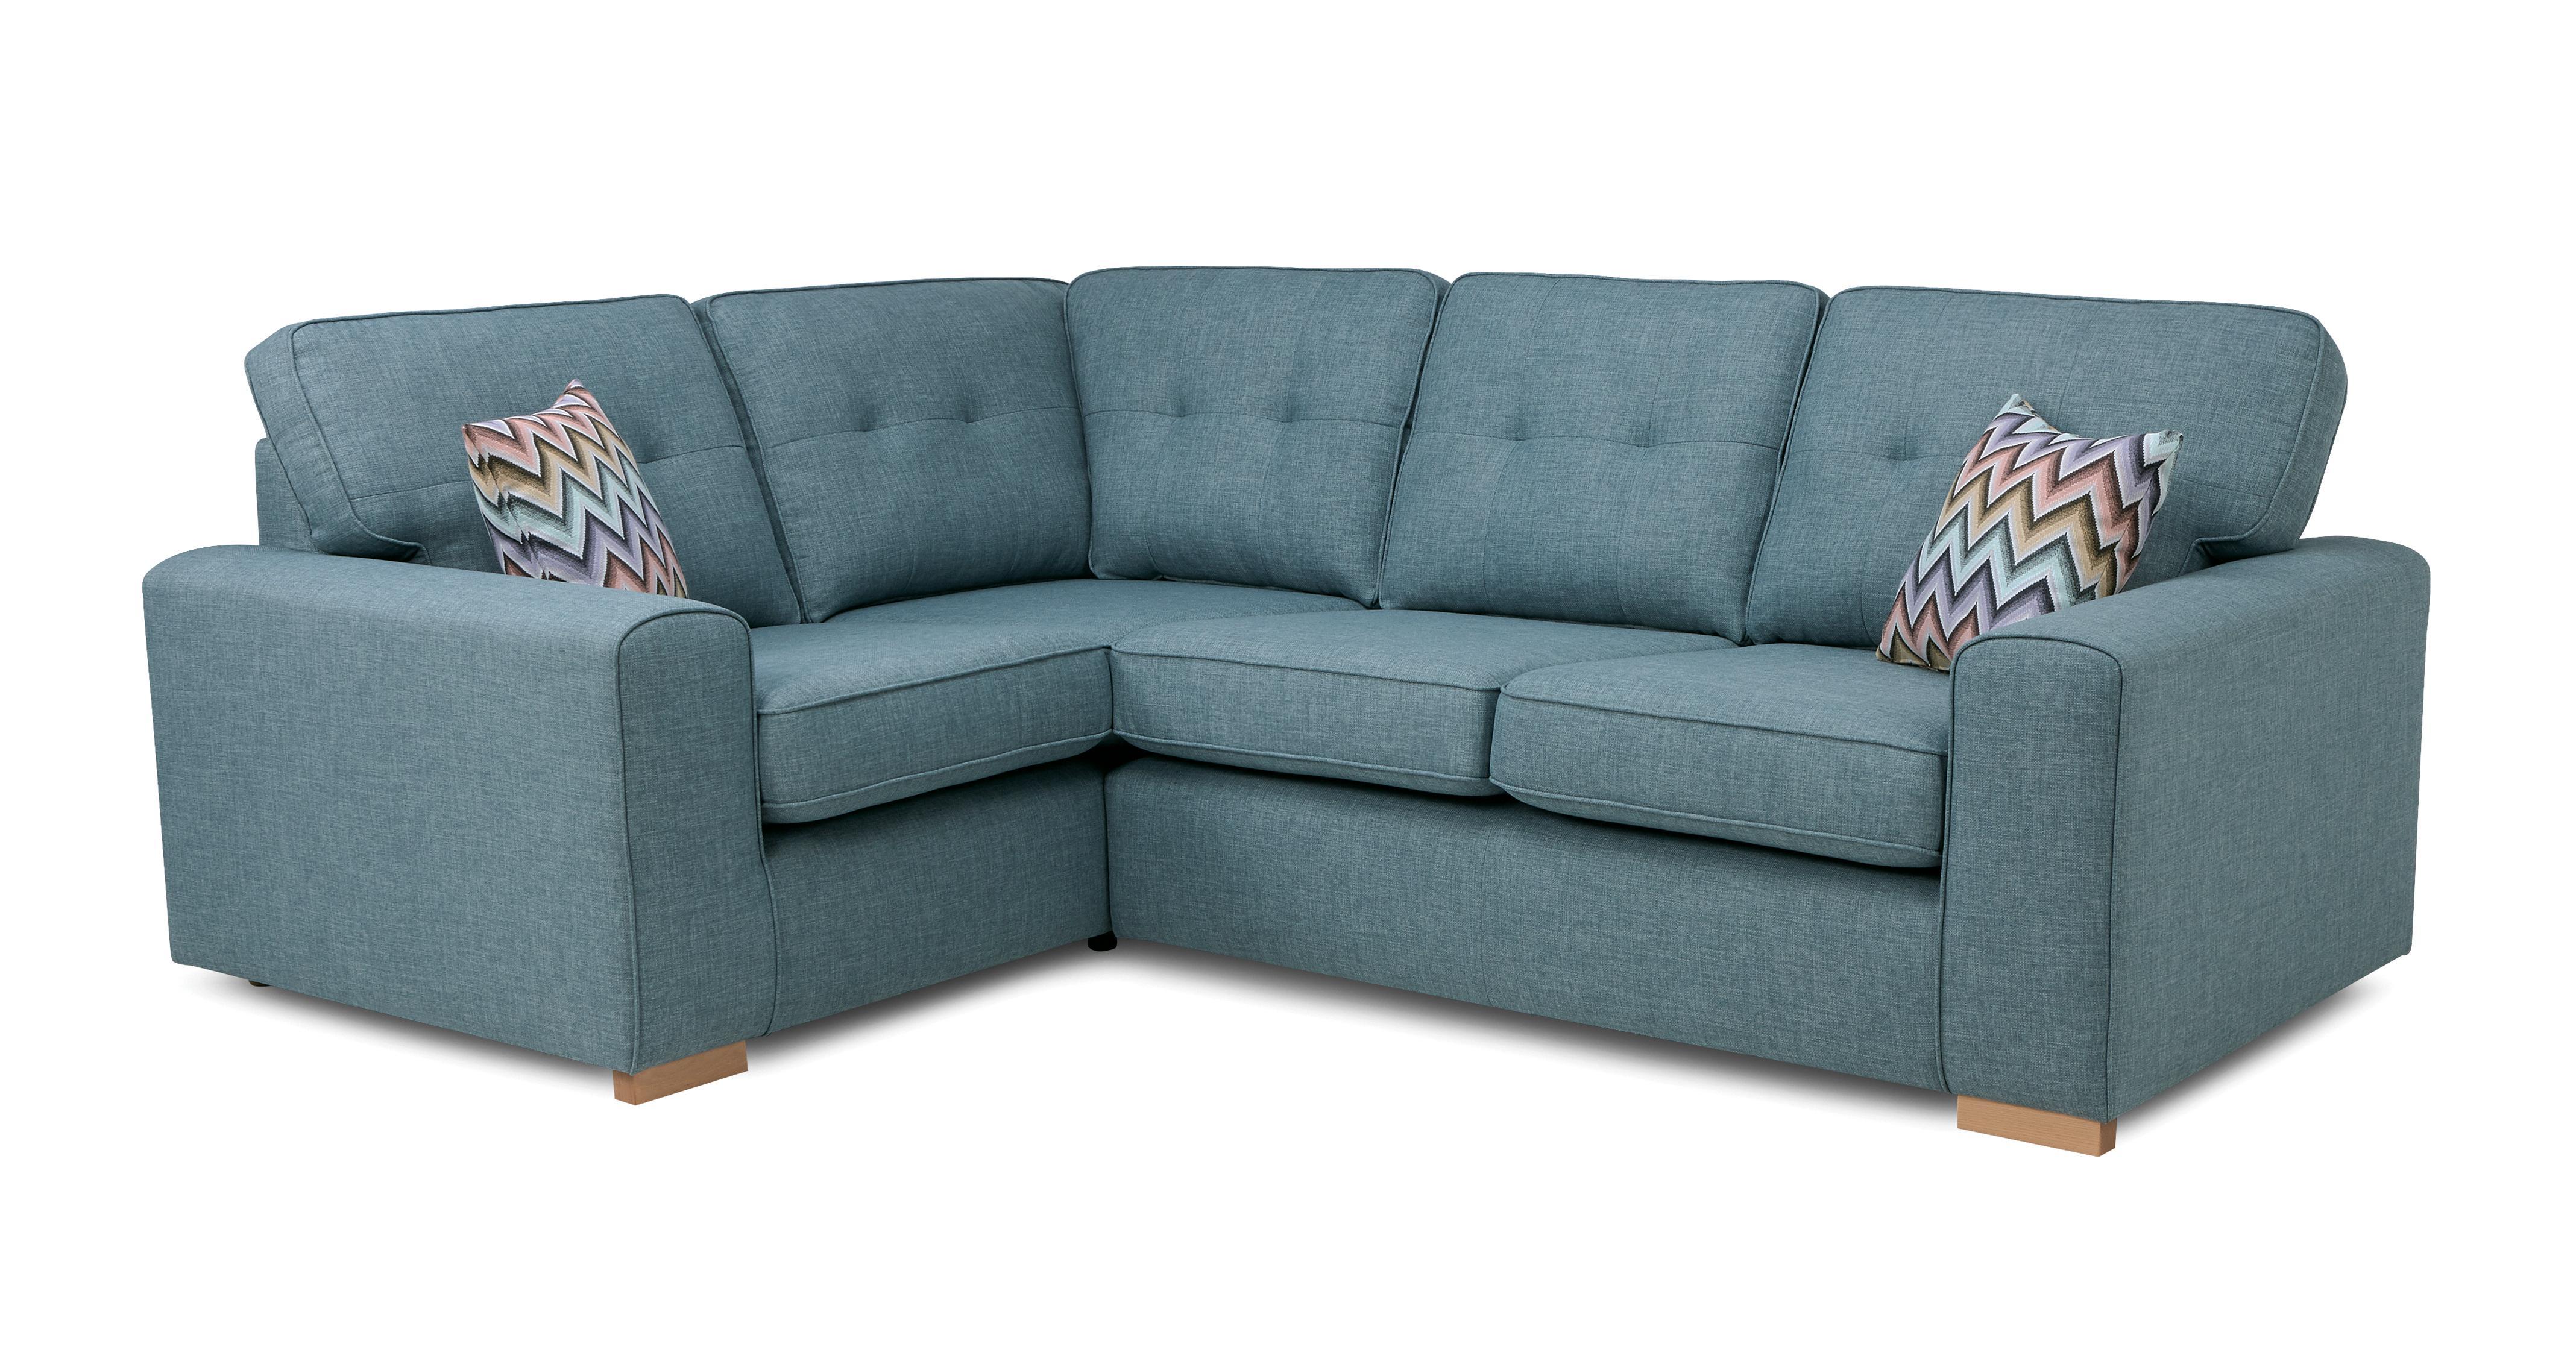 dfs sophia sofa reviews inexpensive sectional sofas for small spaces review | brokeasshome.com